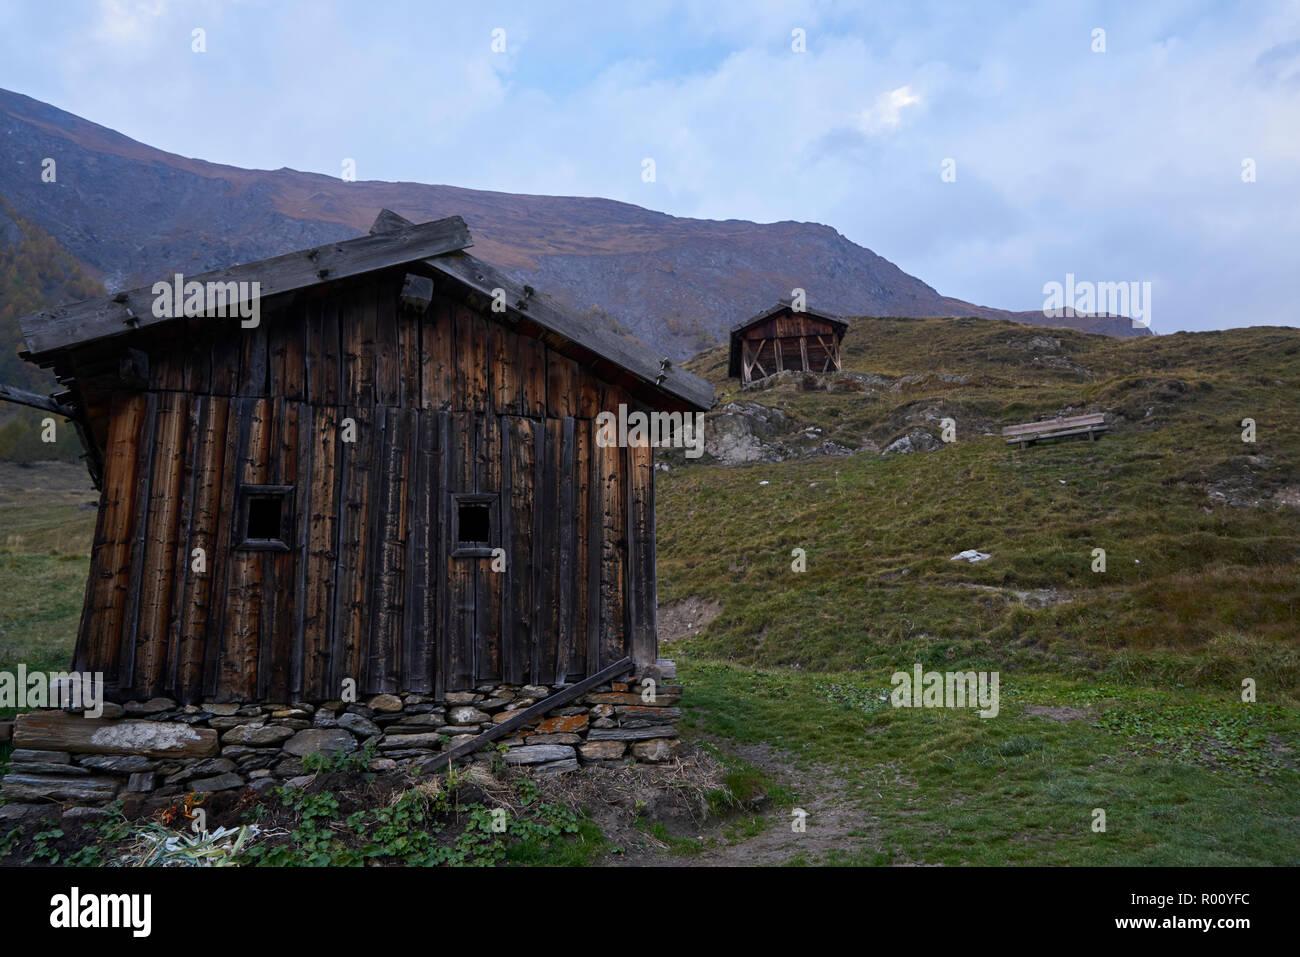 Fane Alm avec Pfundigerer, montagnes du Tyrol du Sud, Italie Banque D'Images